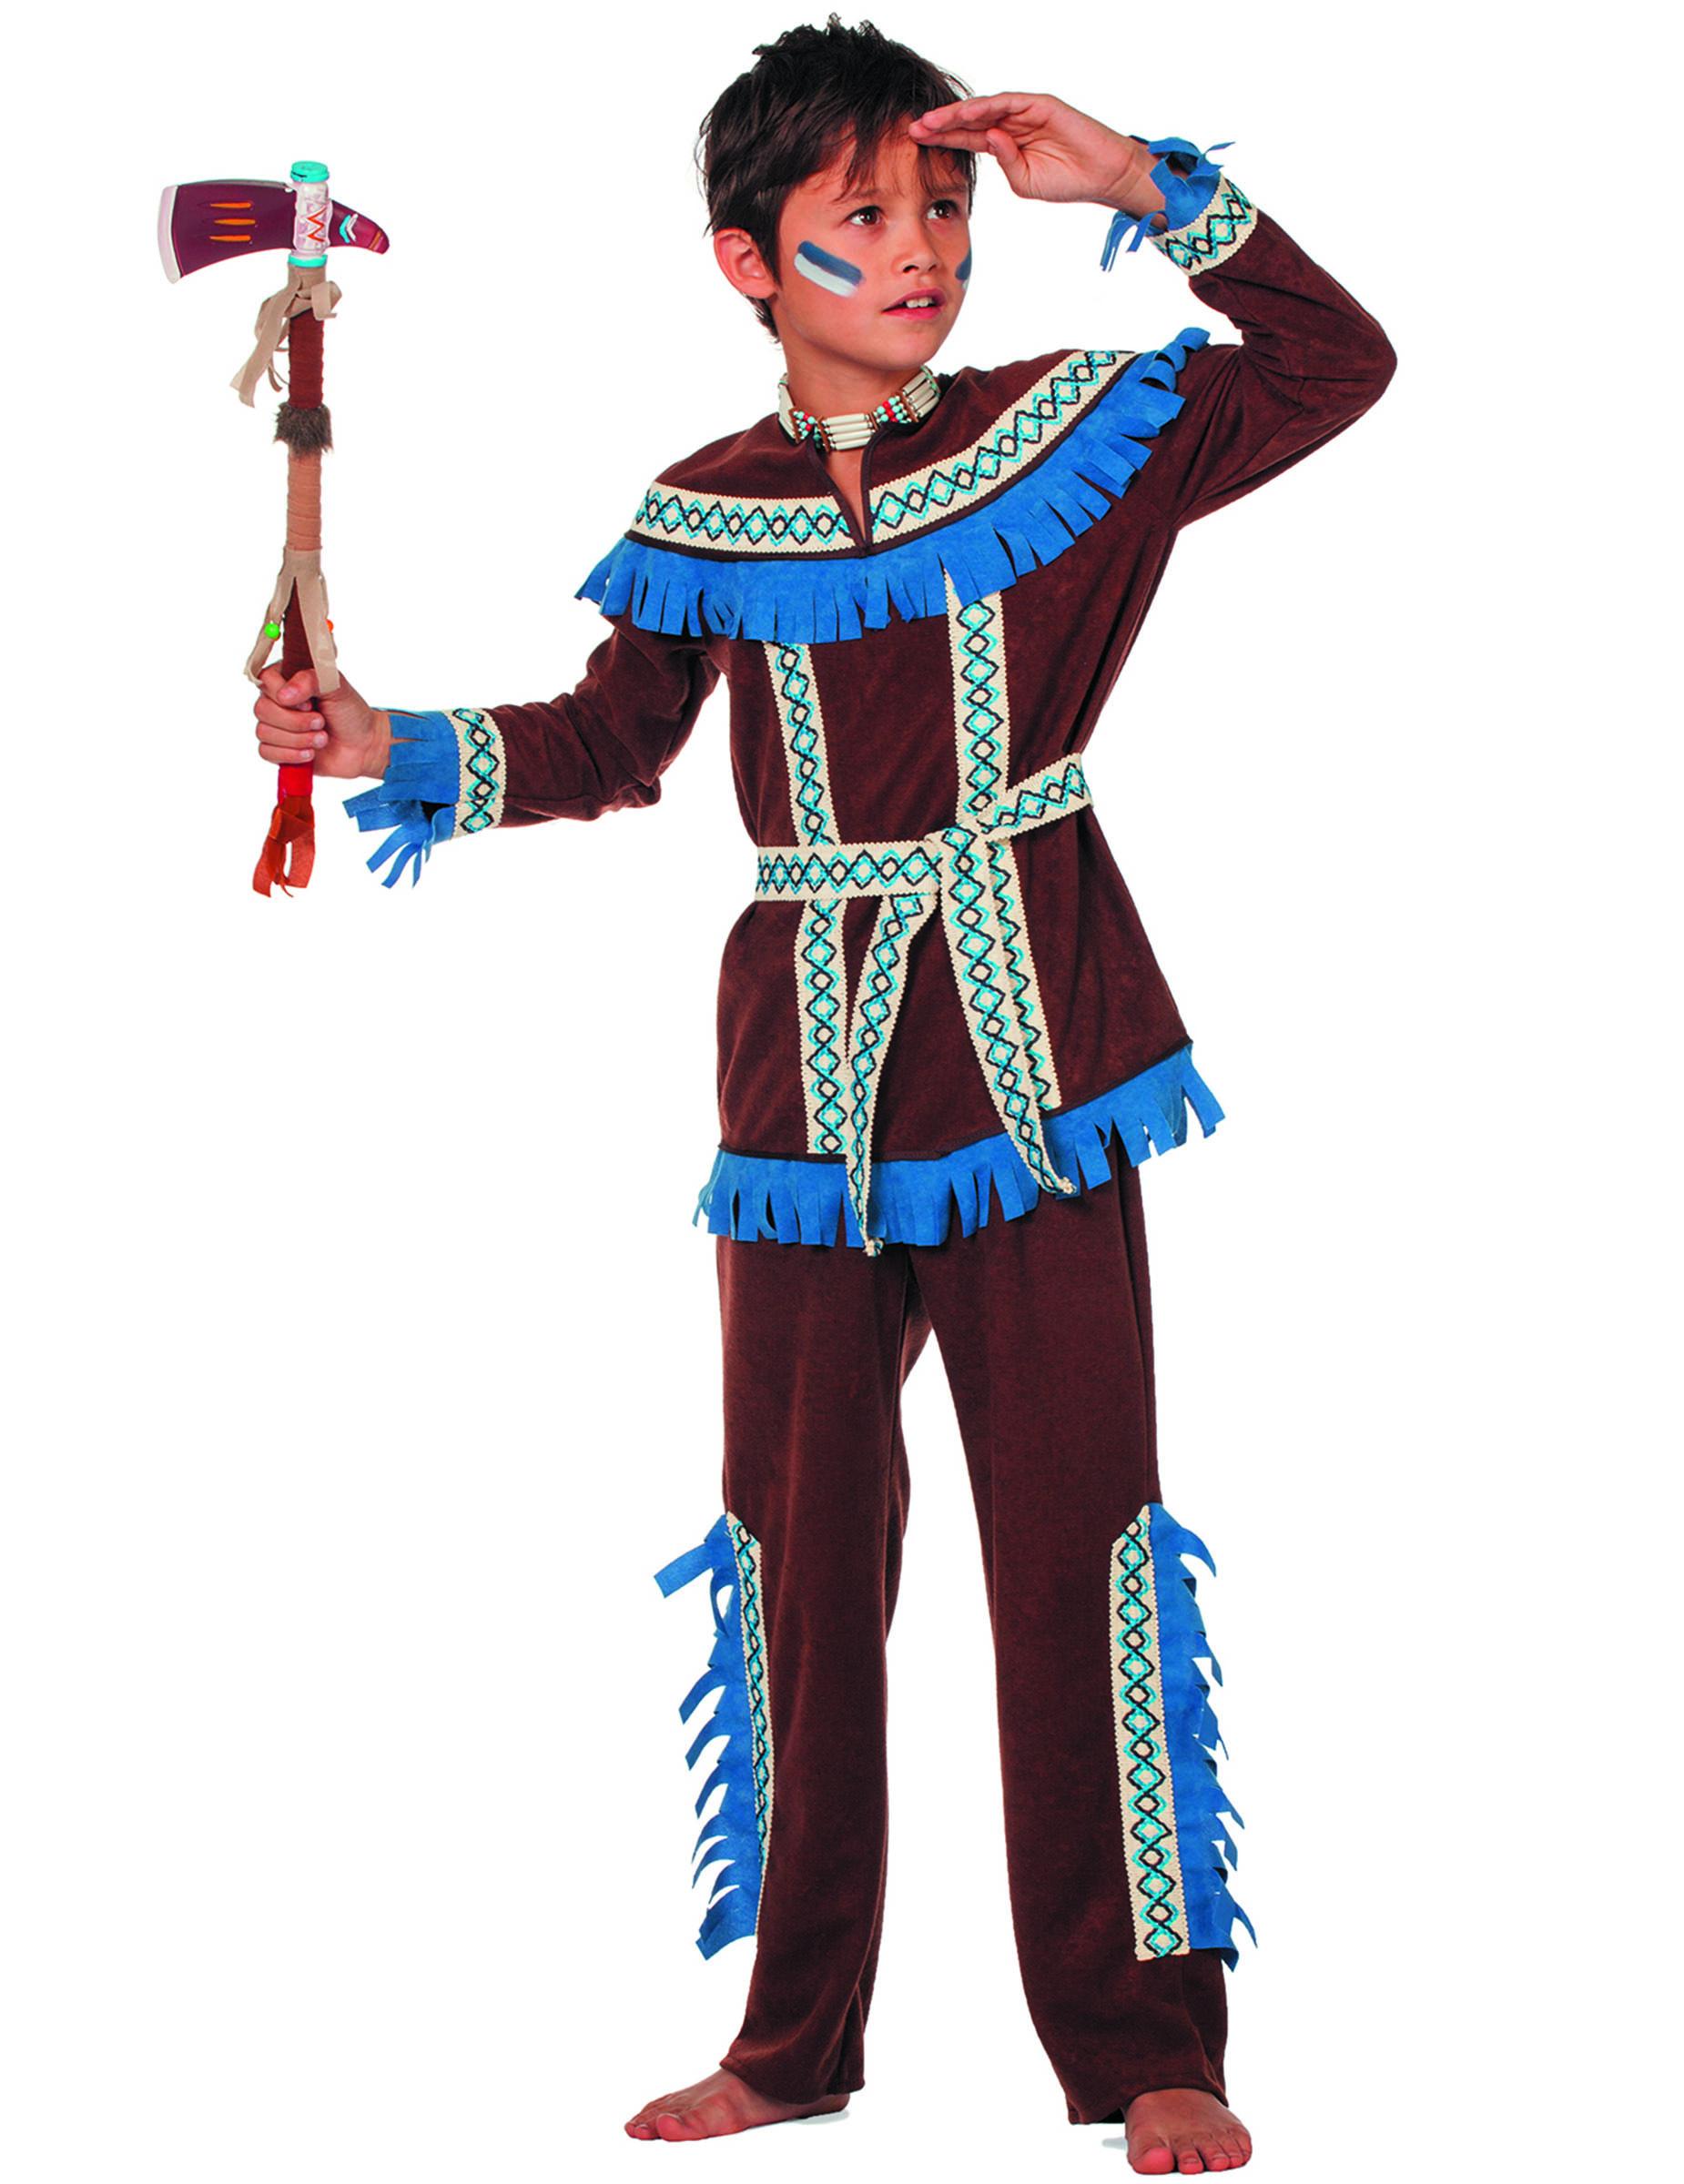 indianerkrieger kinderkost m blau g nstige faschings kost me bei karneval megastore. Black Bedroom Furniture Sets. Home Design Ideas